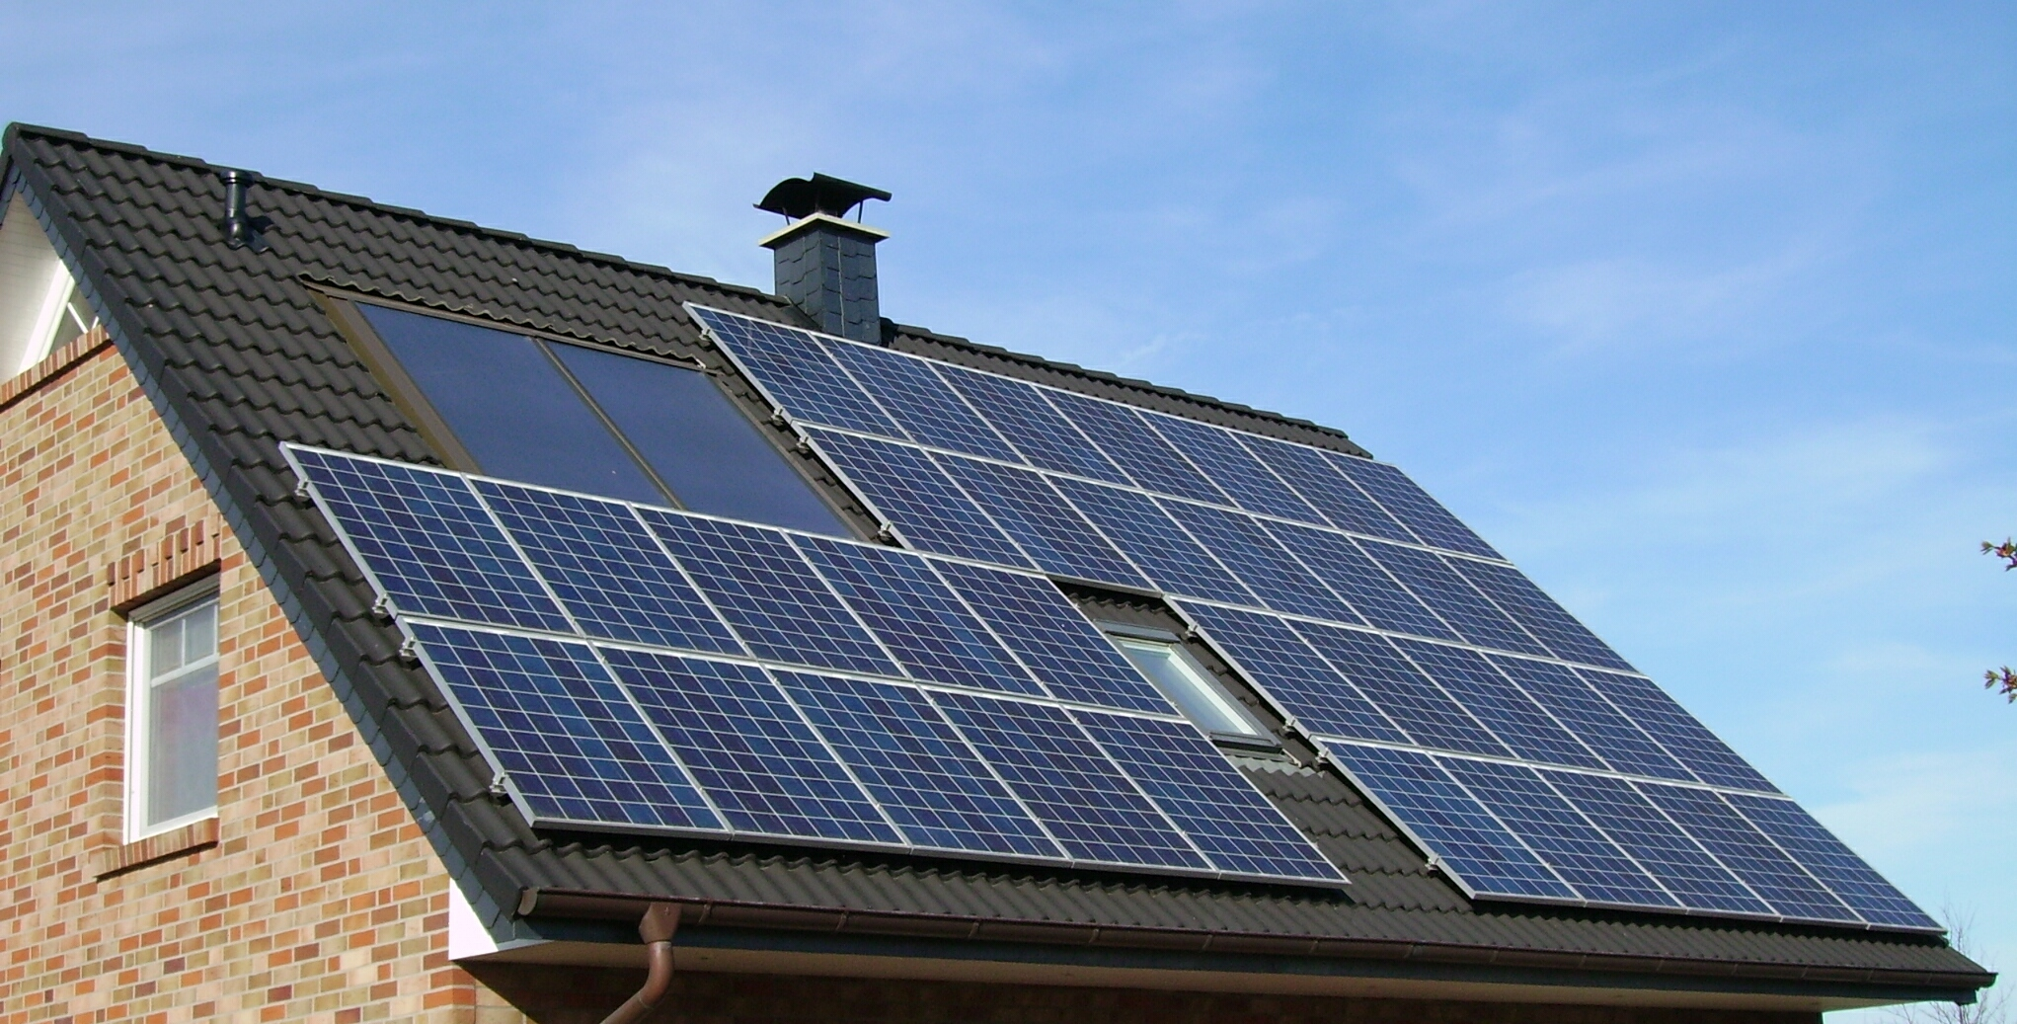 solar-panels-feed-in-tarriff-cut